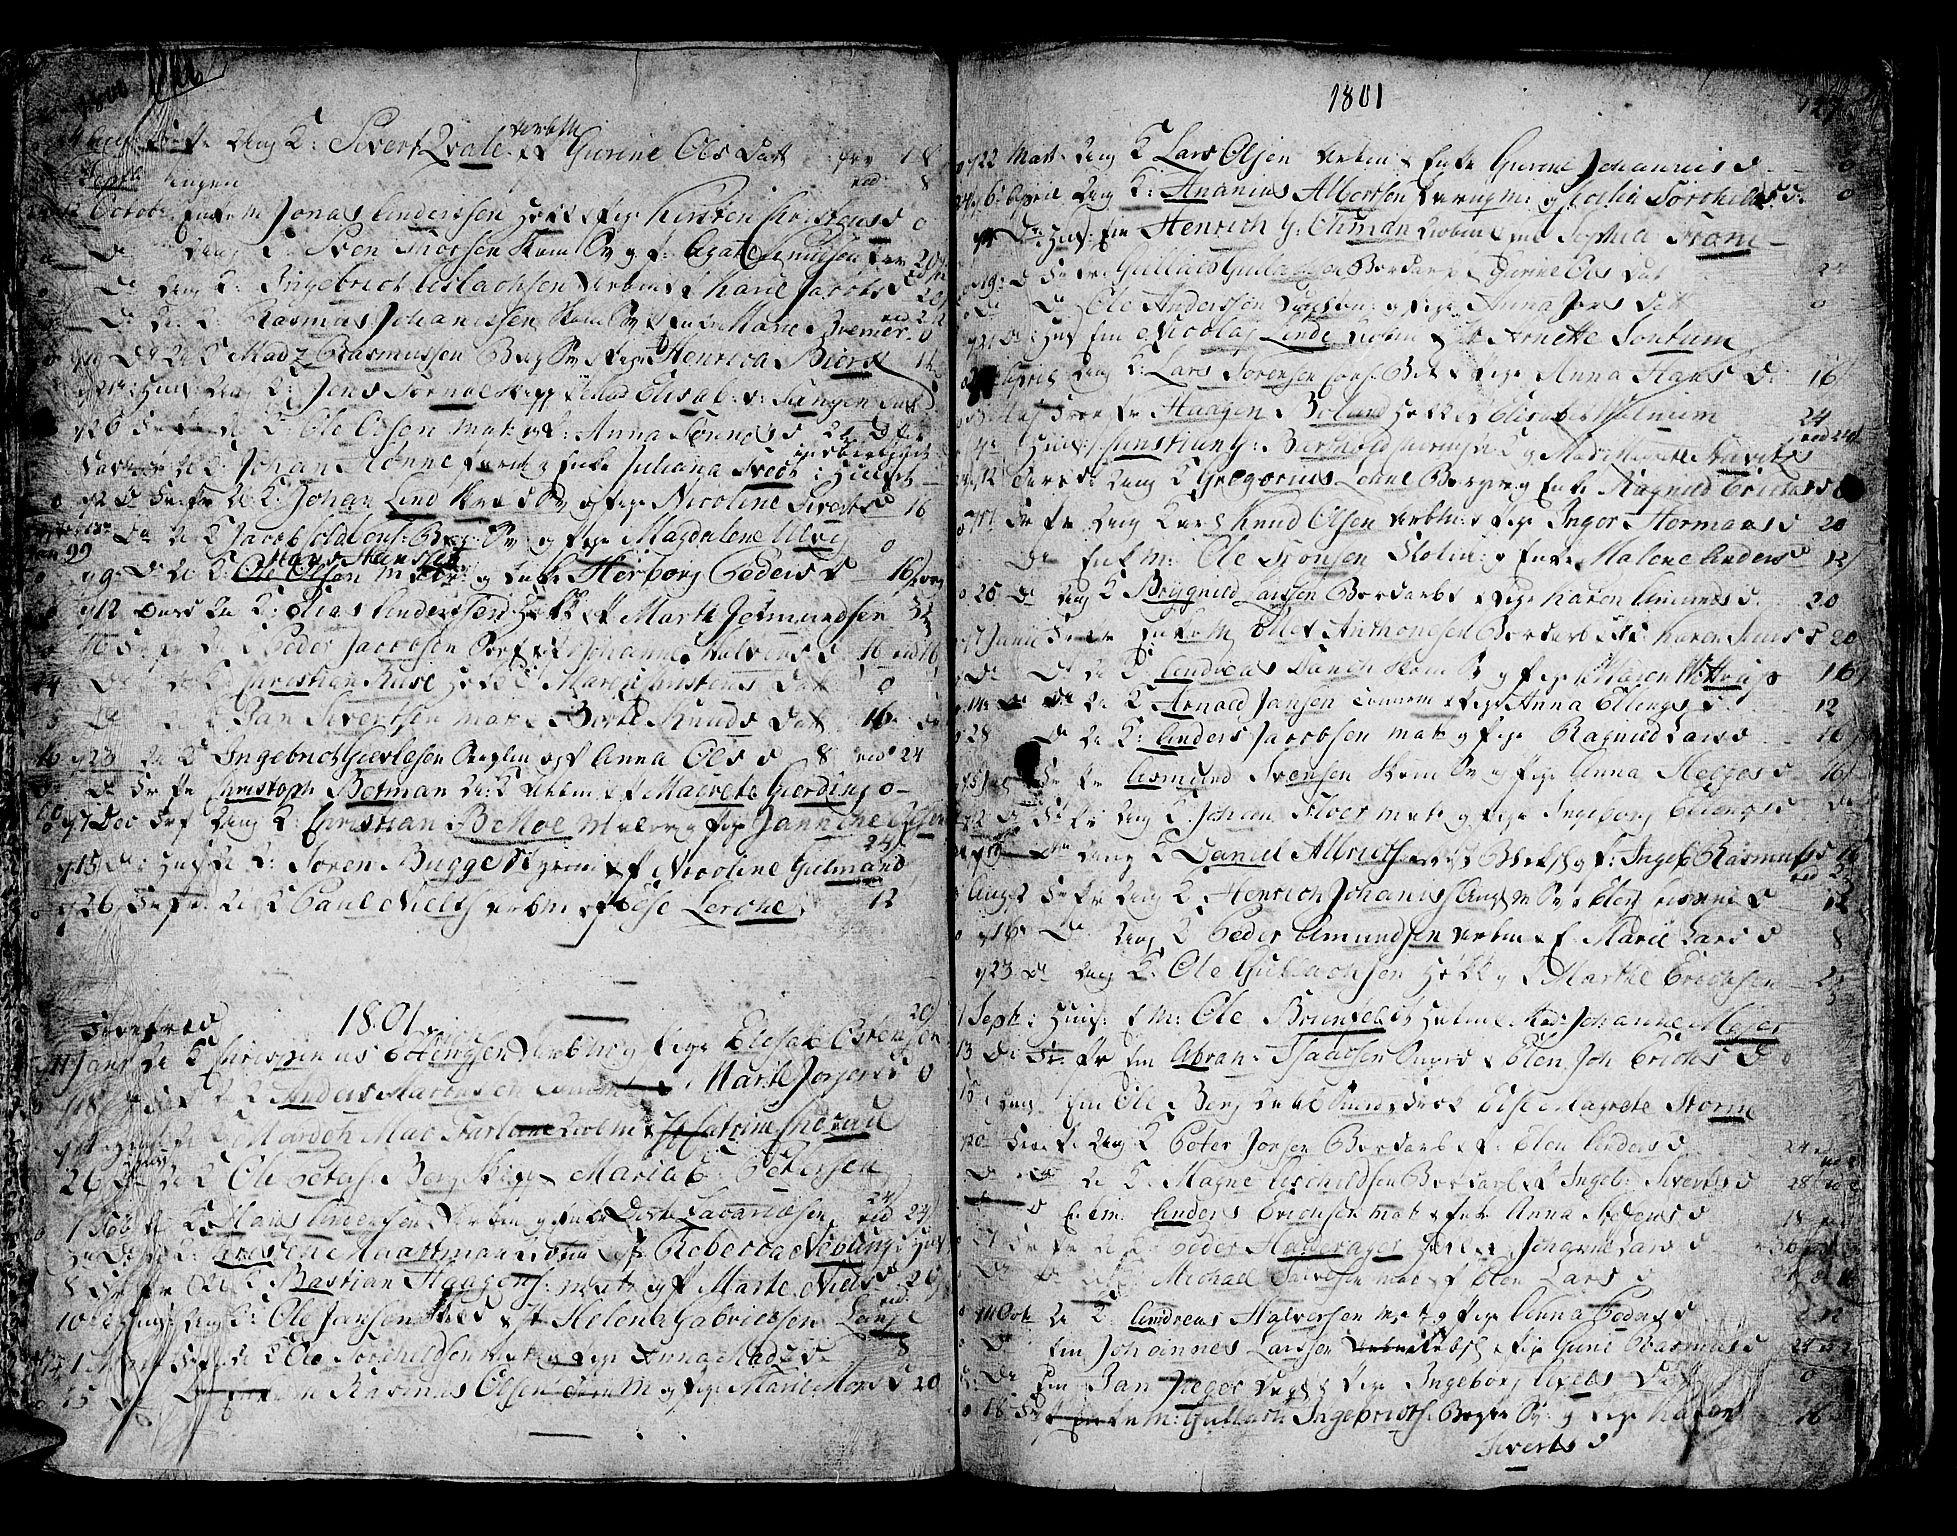 SAB, Domkirken Sokneprestembete, H/Haa/L0007: Parish register (official) no. A 7, 1725-1826, p. 126-127